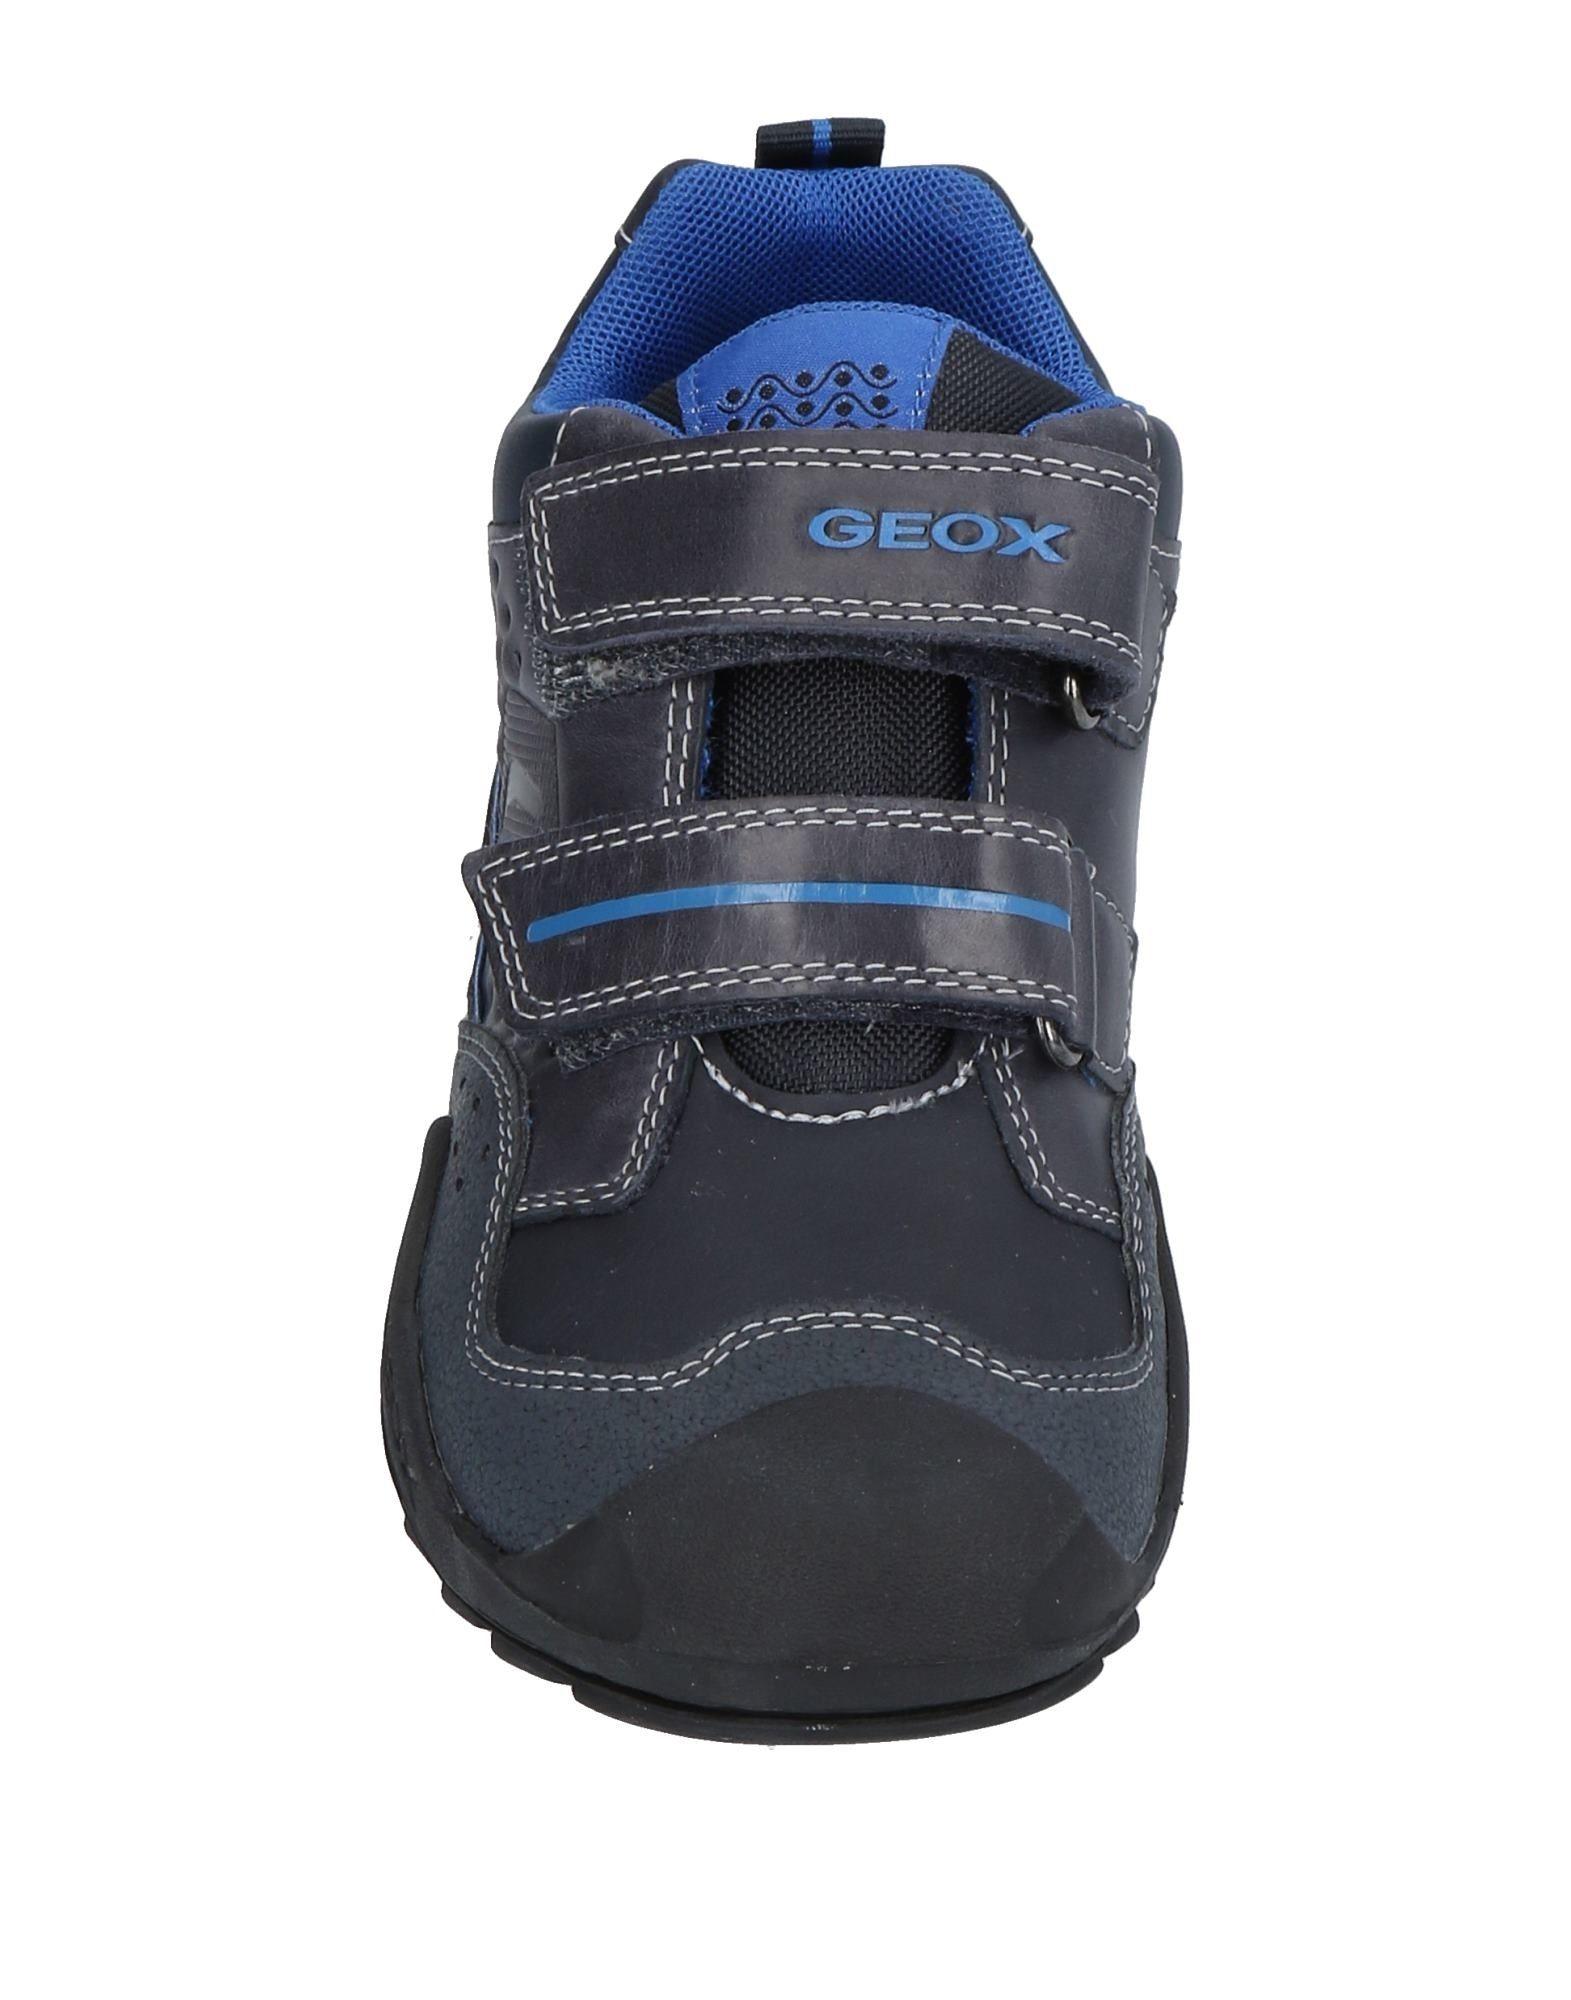 699ff307fc8 GEOX ΠΑΠΟΥΤΣΙΑ Παπούτσια τένις χαμηλά, Παιδικά αθλητικά παπούτσια διάφορα,  ΠΑΙΔΙ | ΠΑΠΟΥΤΣΙΑ | ΔΙΑΦΟΡΑ